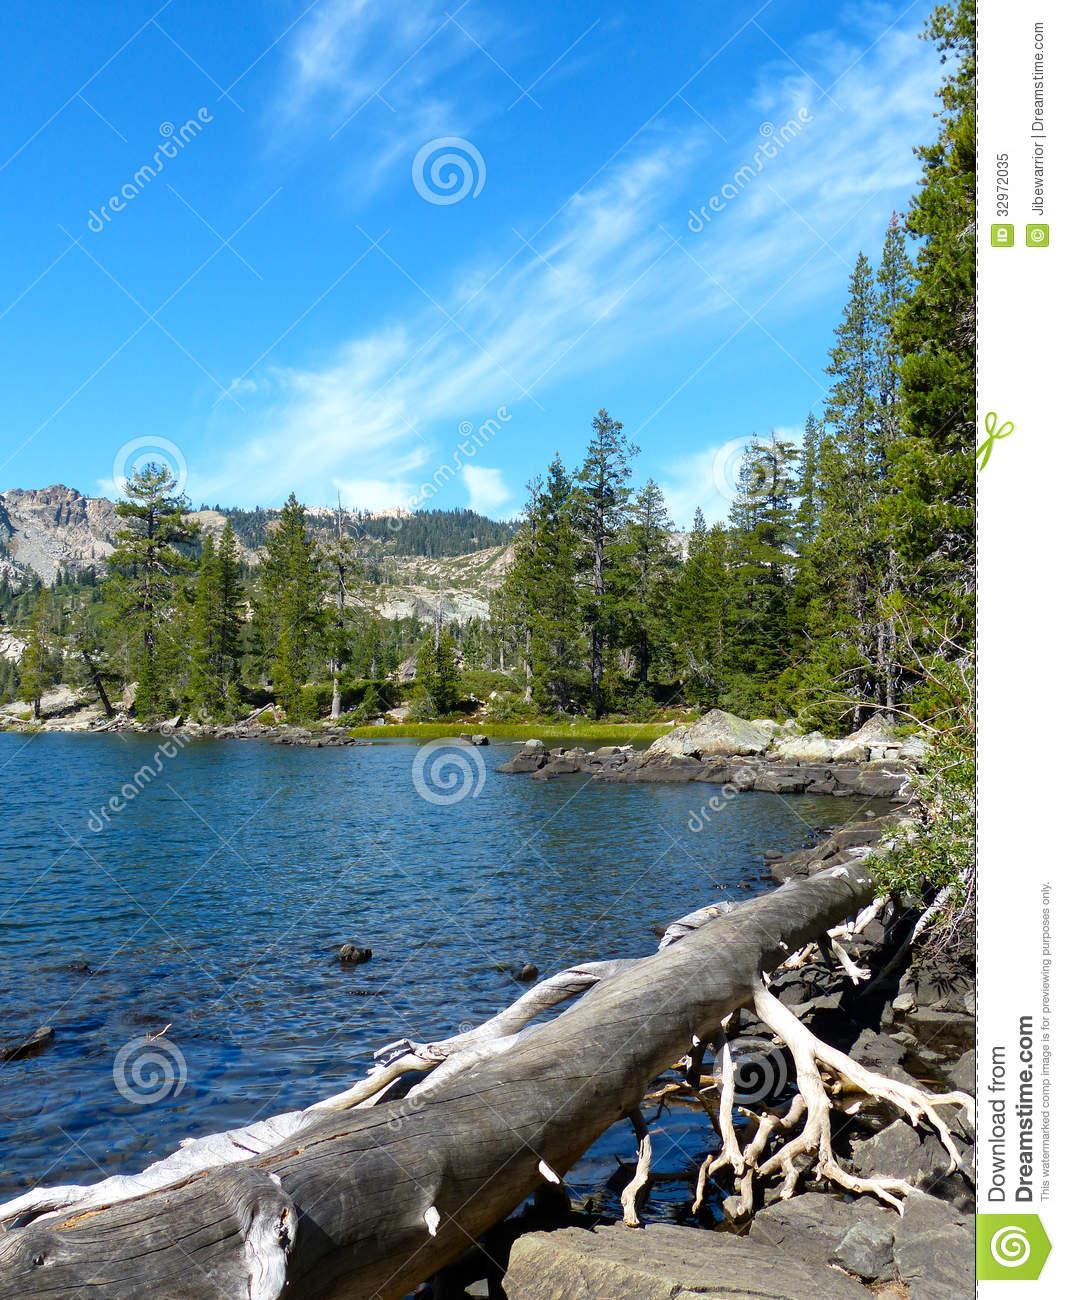 Bear Lakes Basin clipart #18, Download drawings